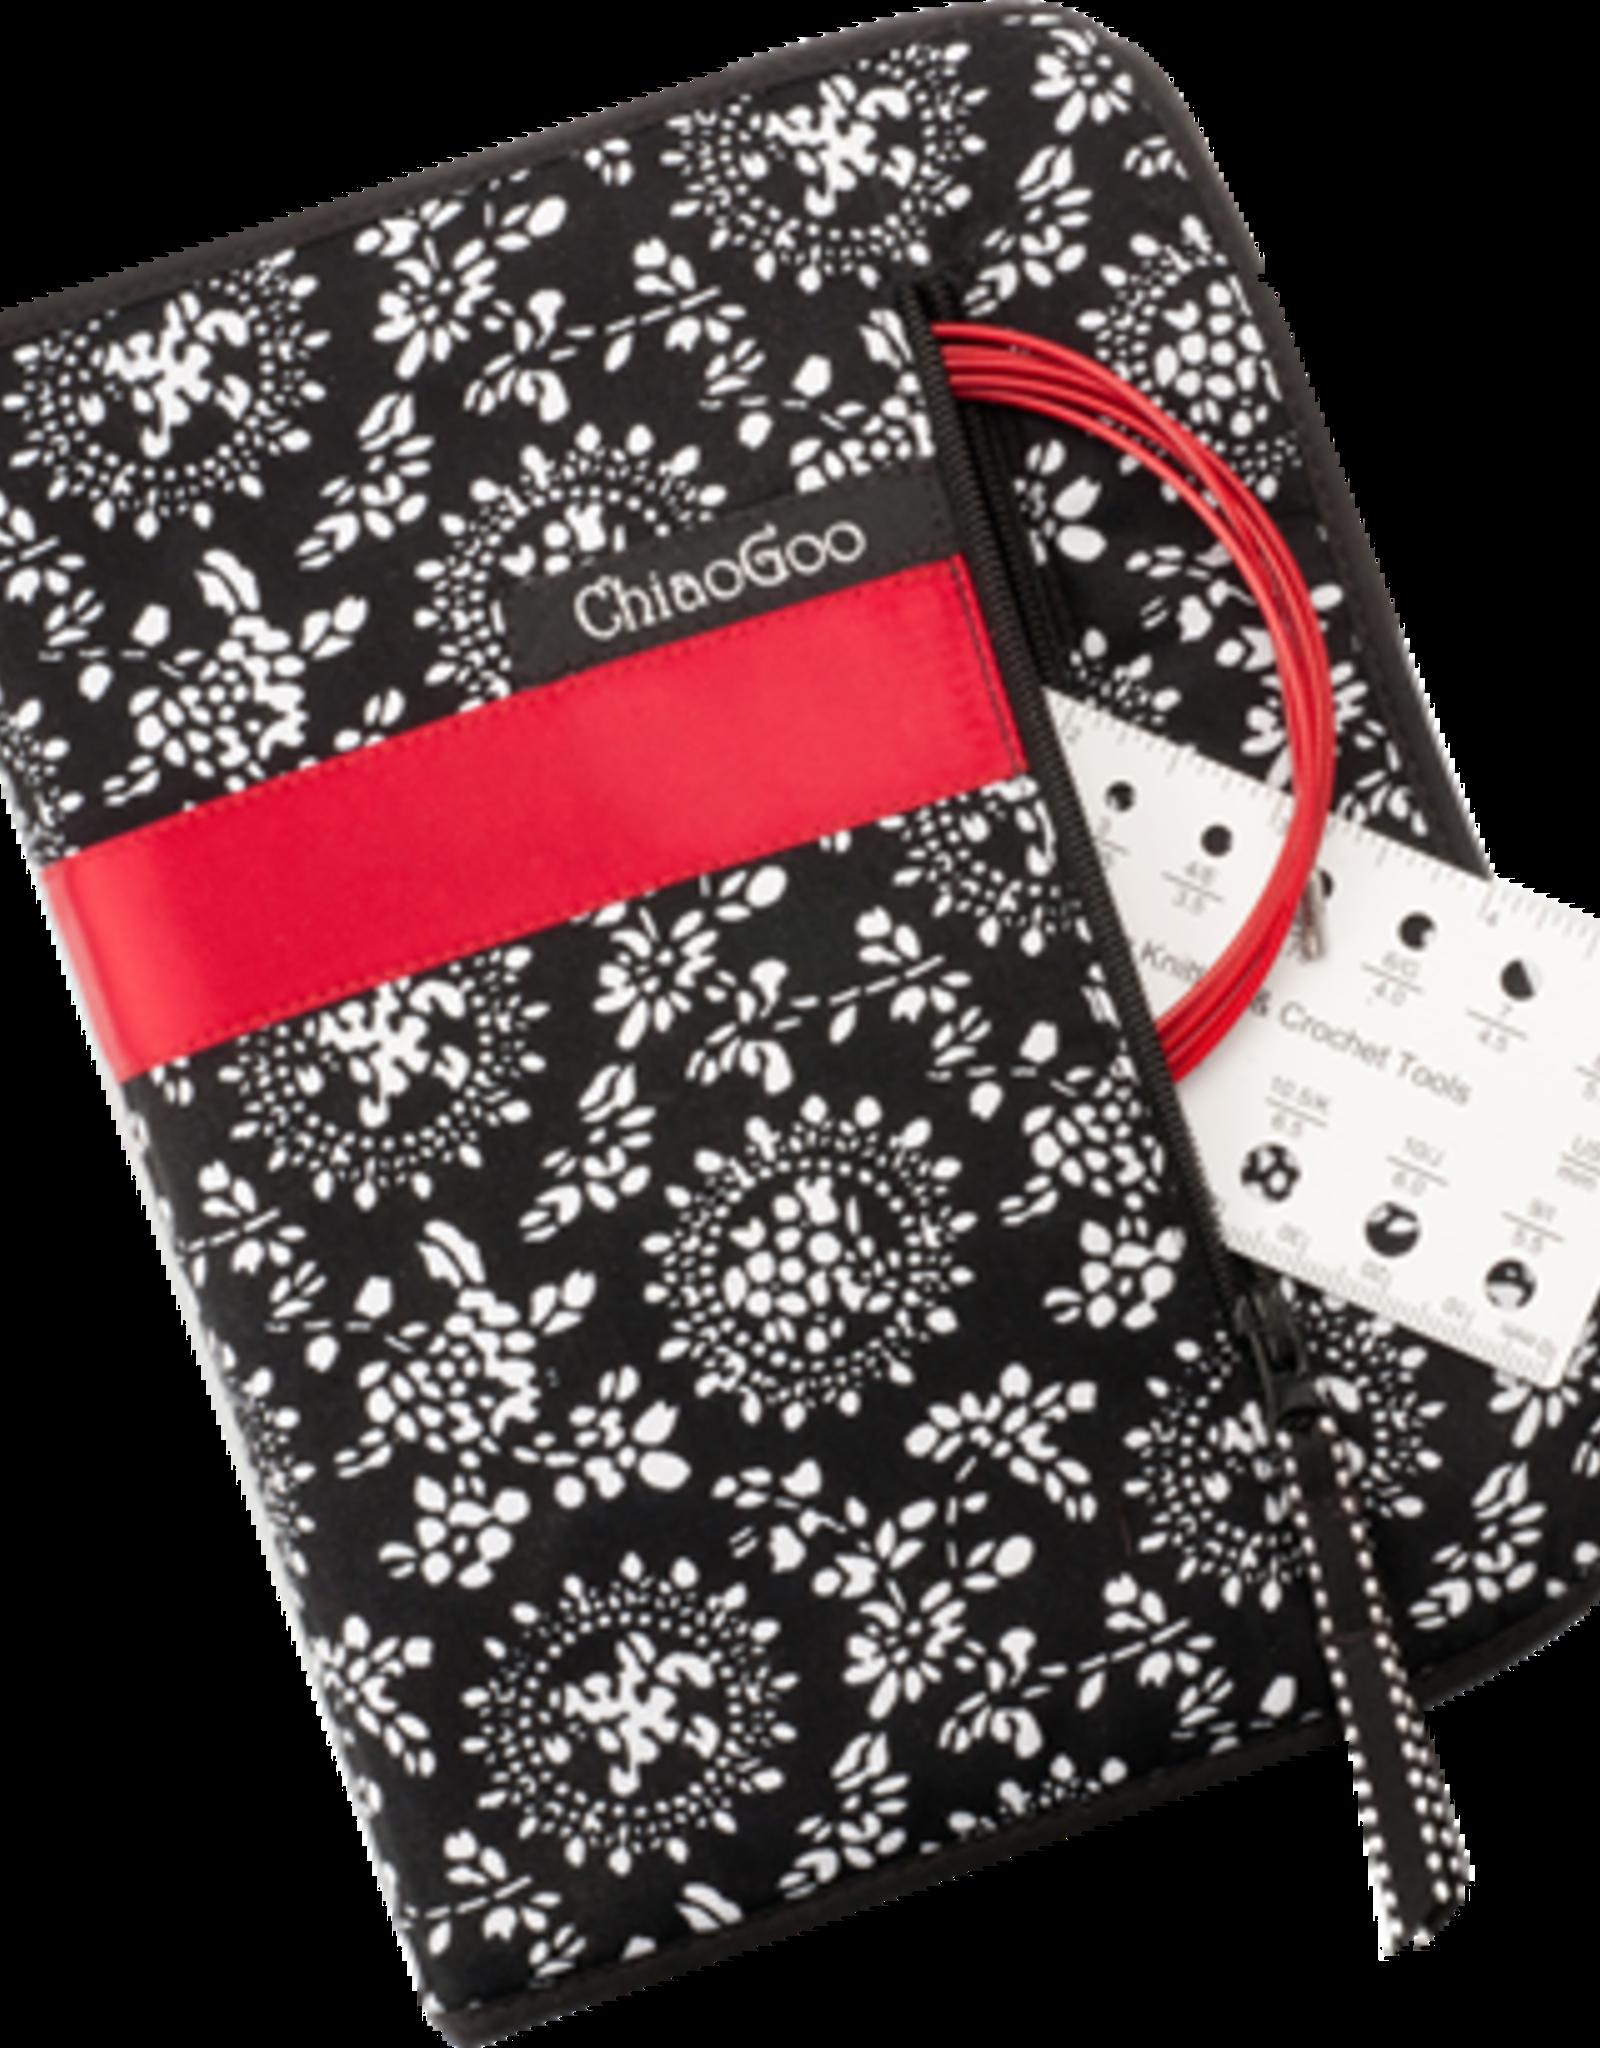 "ChiaoGoo Chiaogoo Twist Red Lace Complete Set 4"" - 2.75mm-10.00mm"